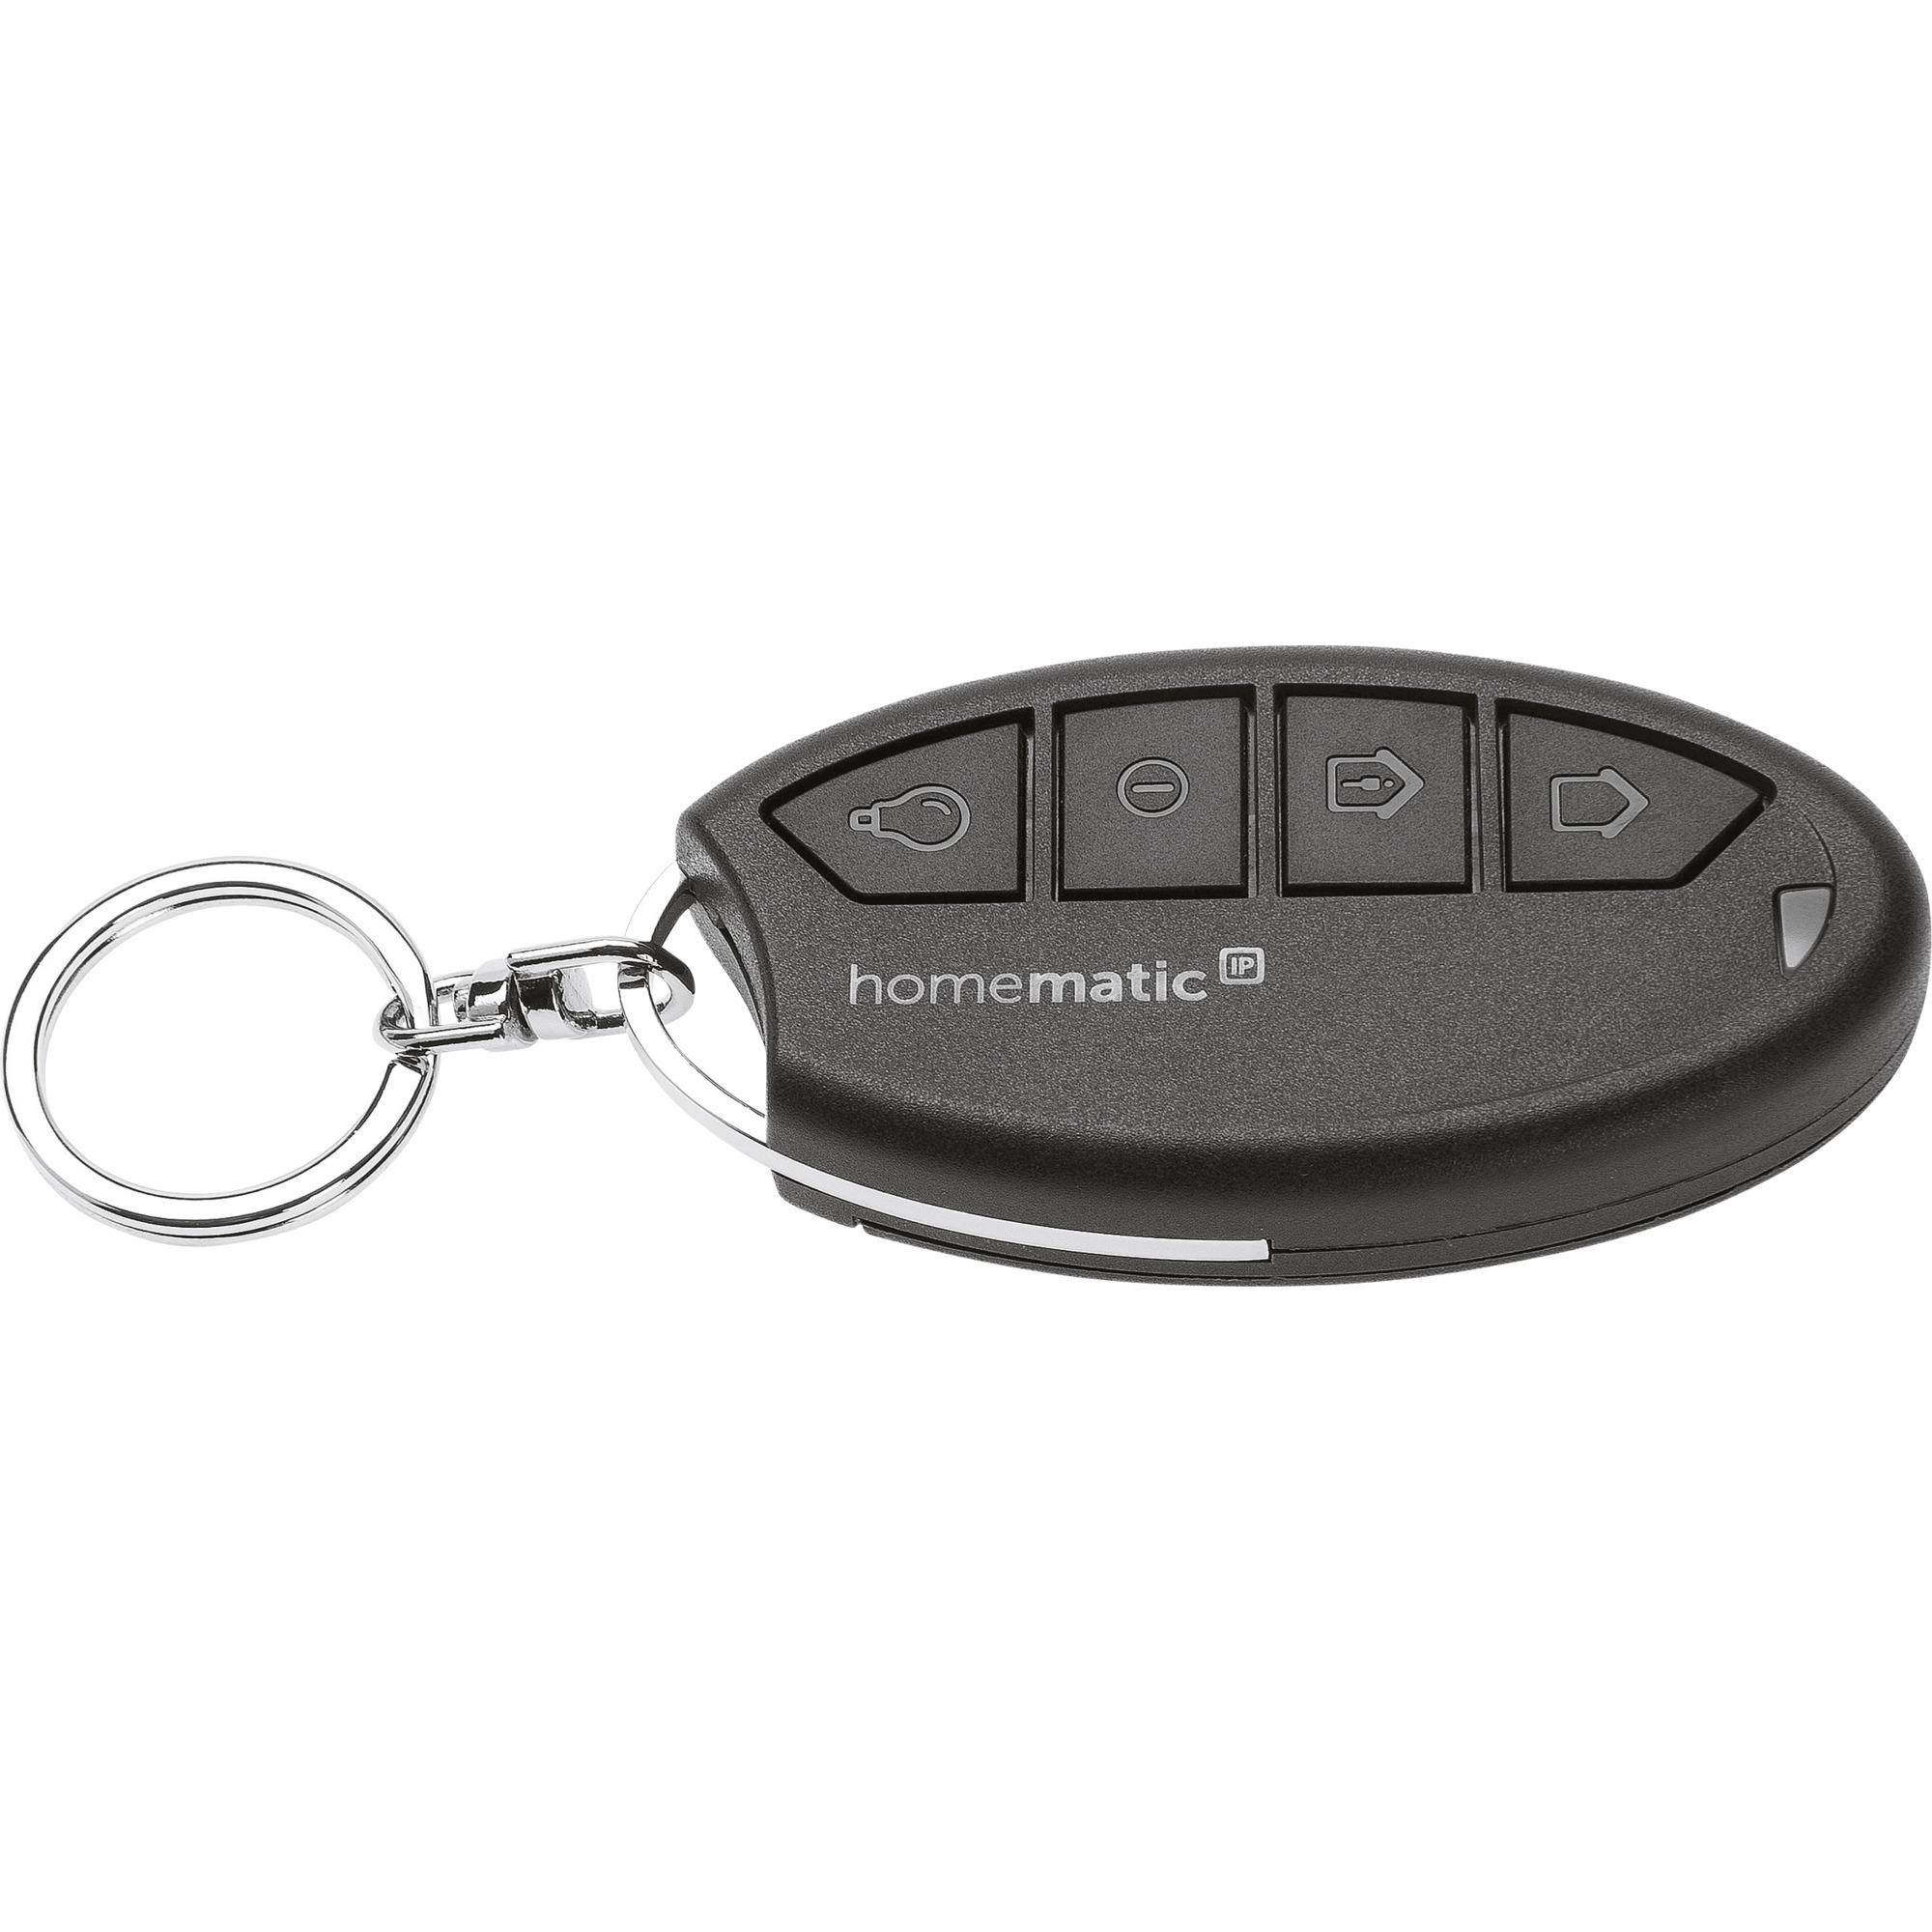 HmIP-KRCA mando a distancia RF inalámbrico Negro Botones